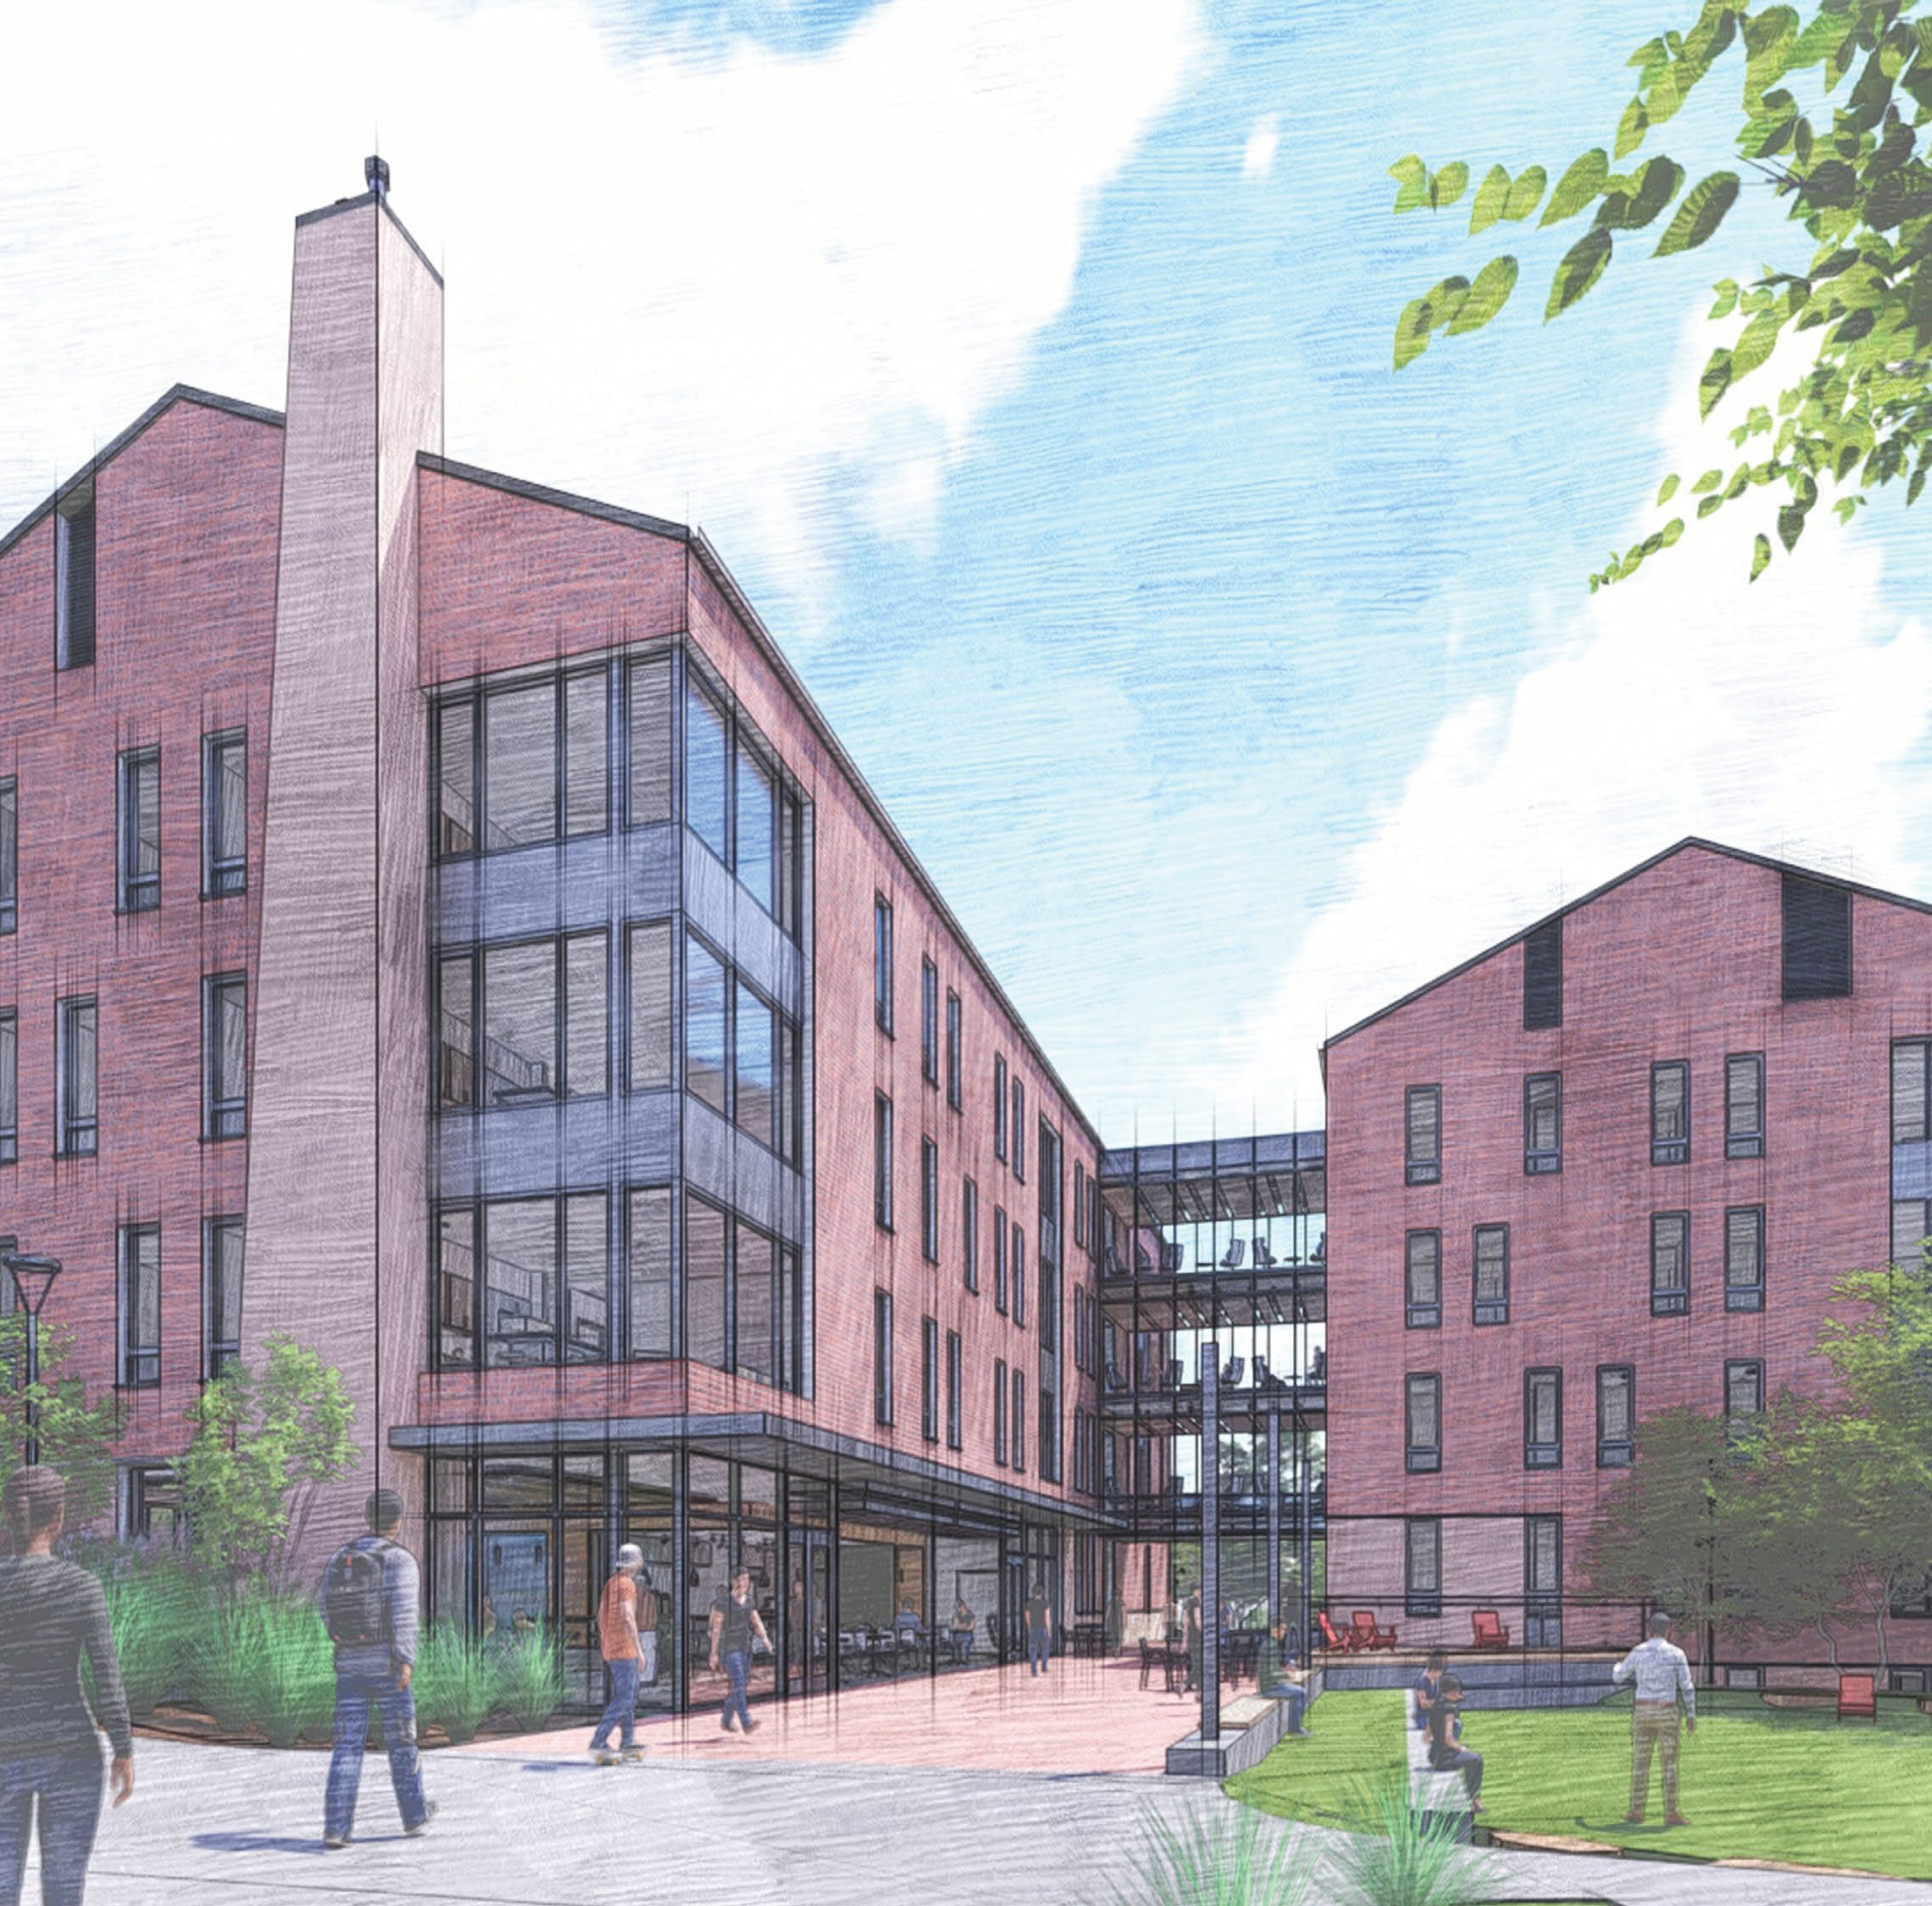 New senior housing, wellness center coming to Denison